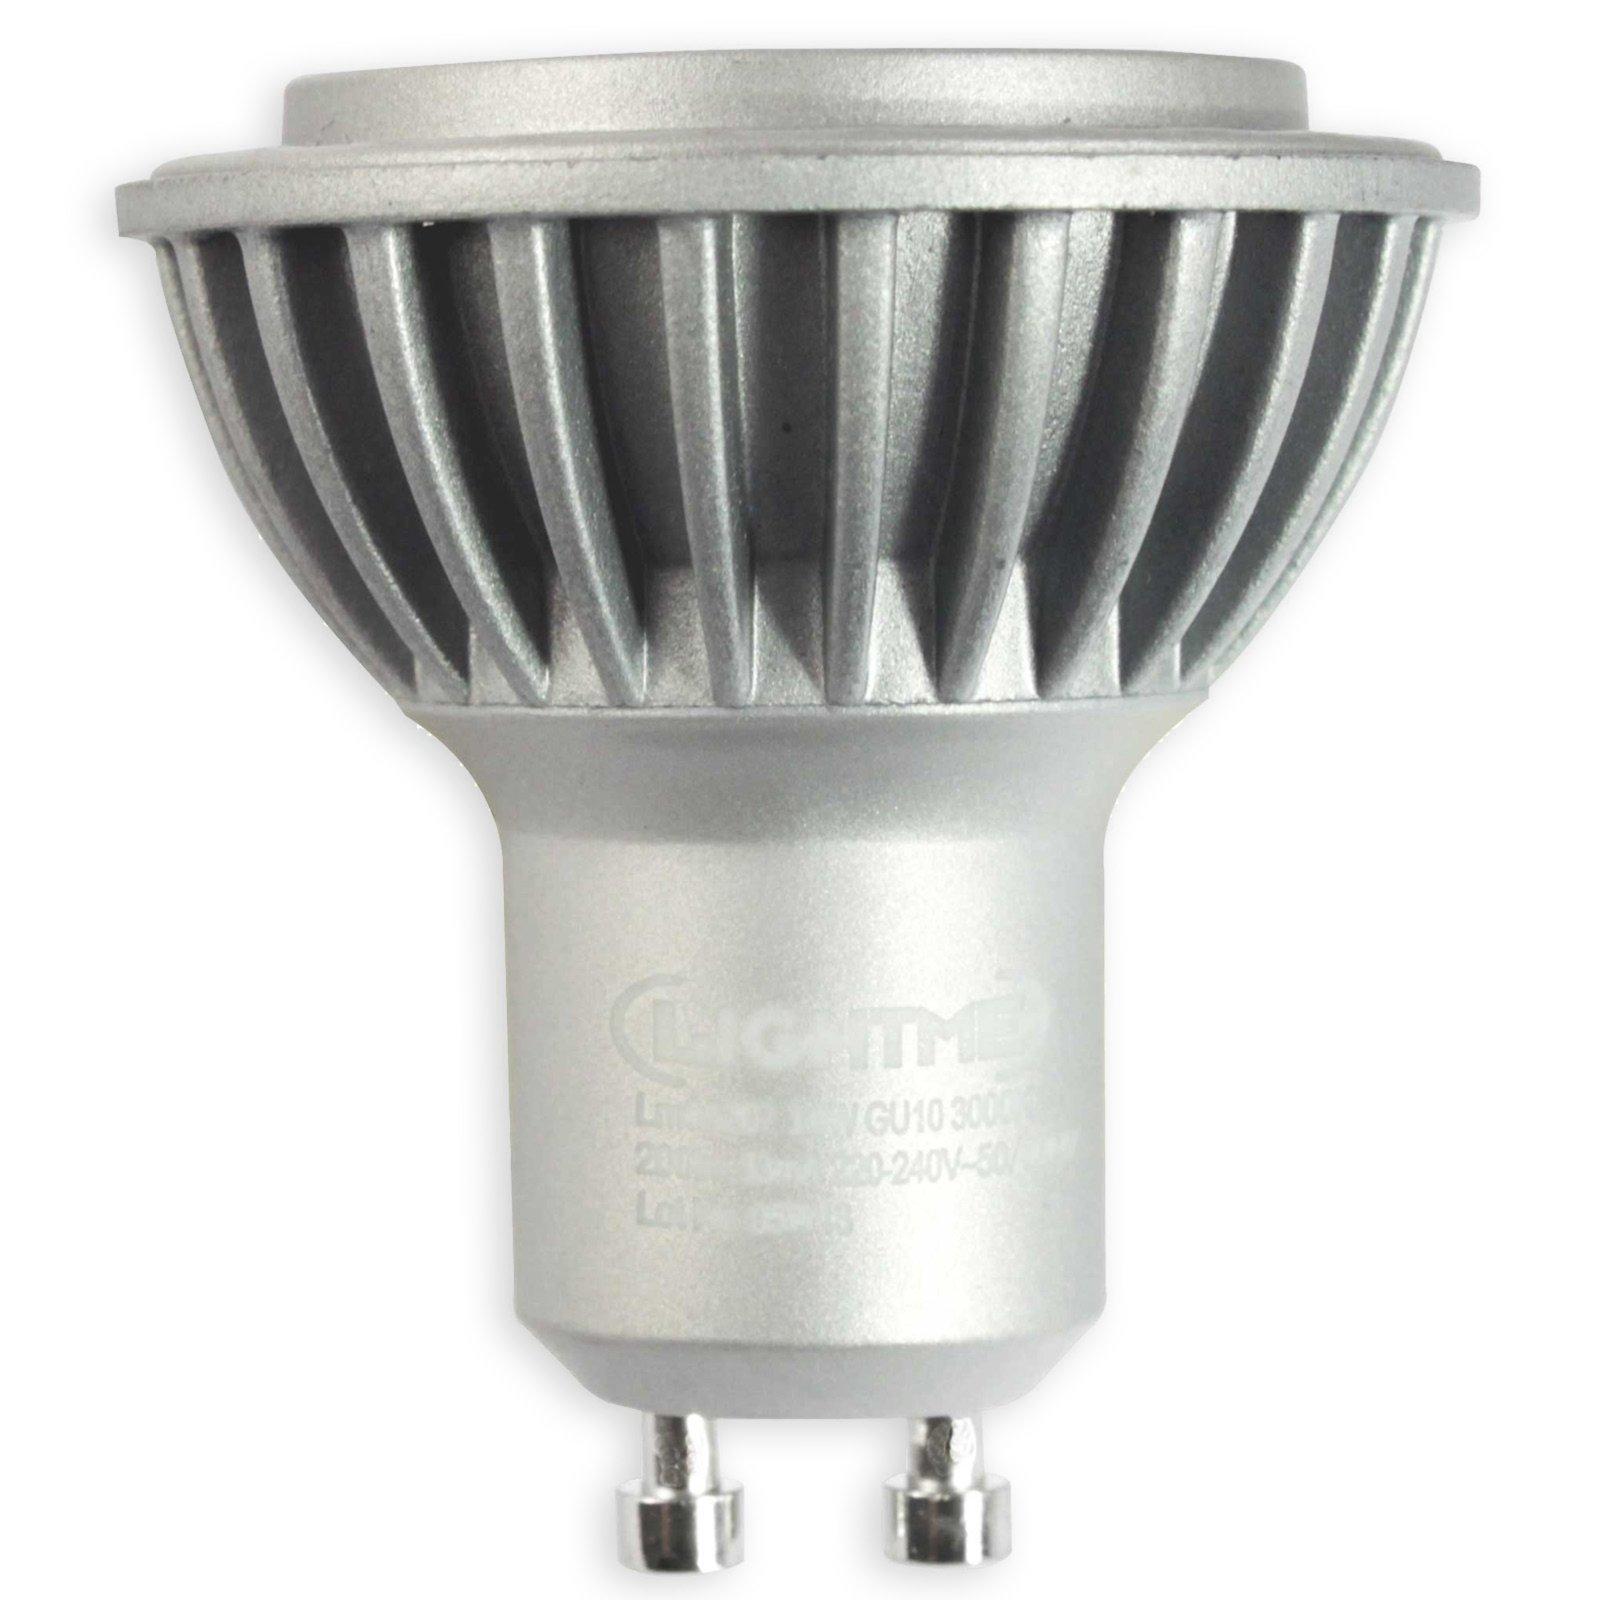 led reflektor lightme gu10 5 watt warmwei led. Black Bedroom Furniture Sets. Home Design Ideas